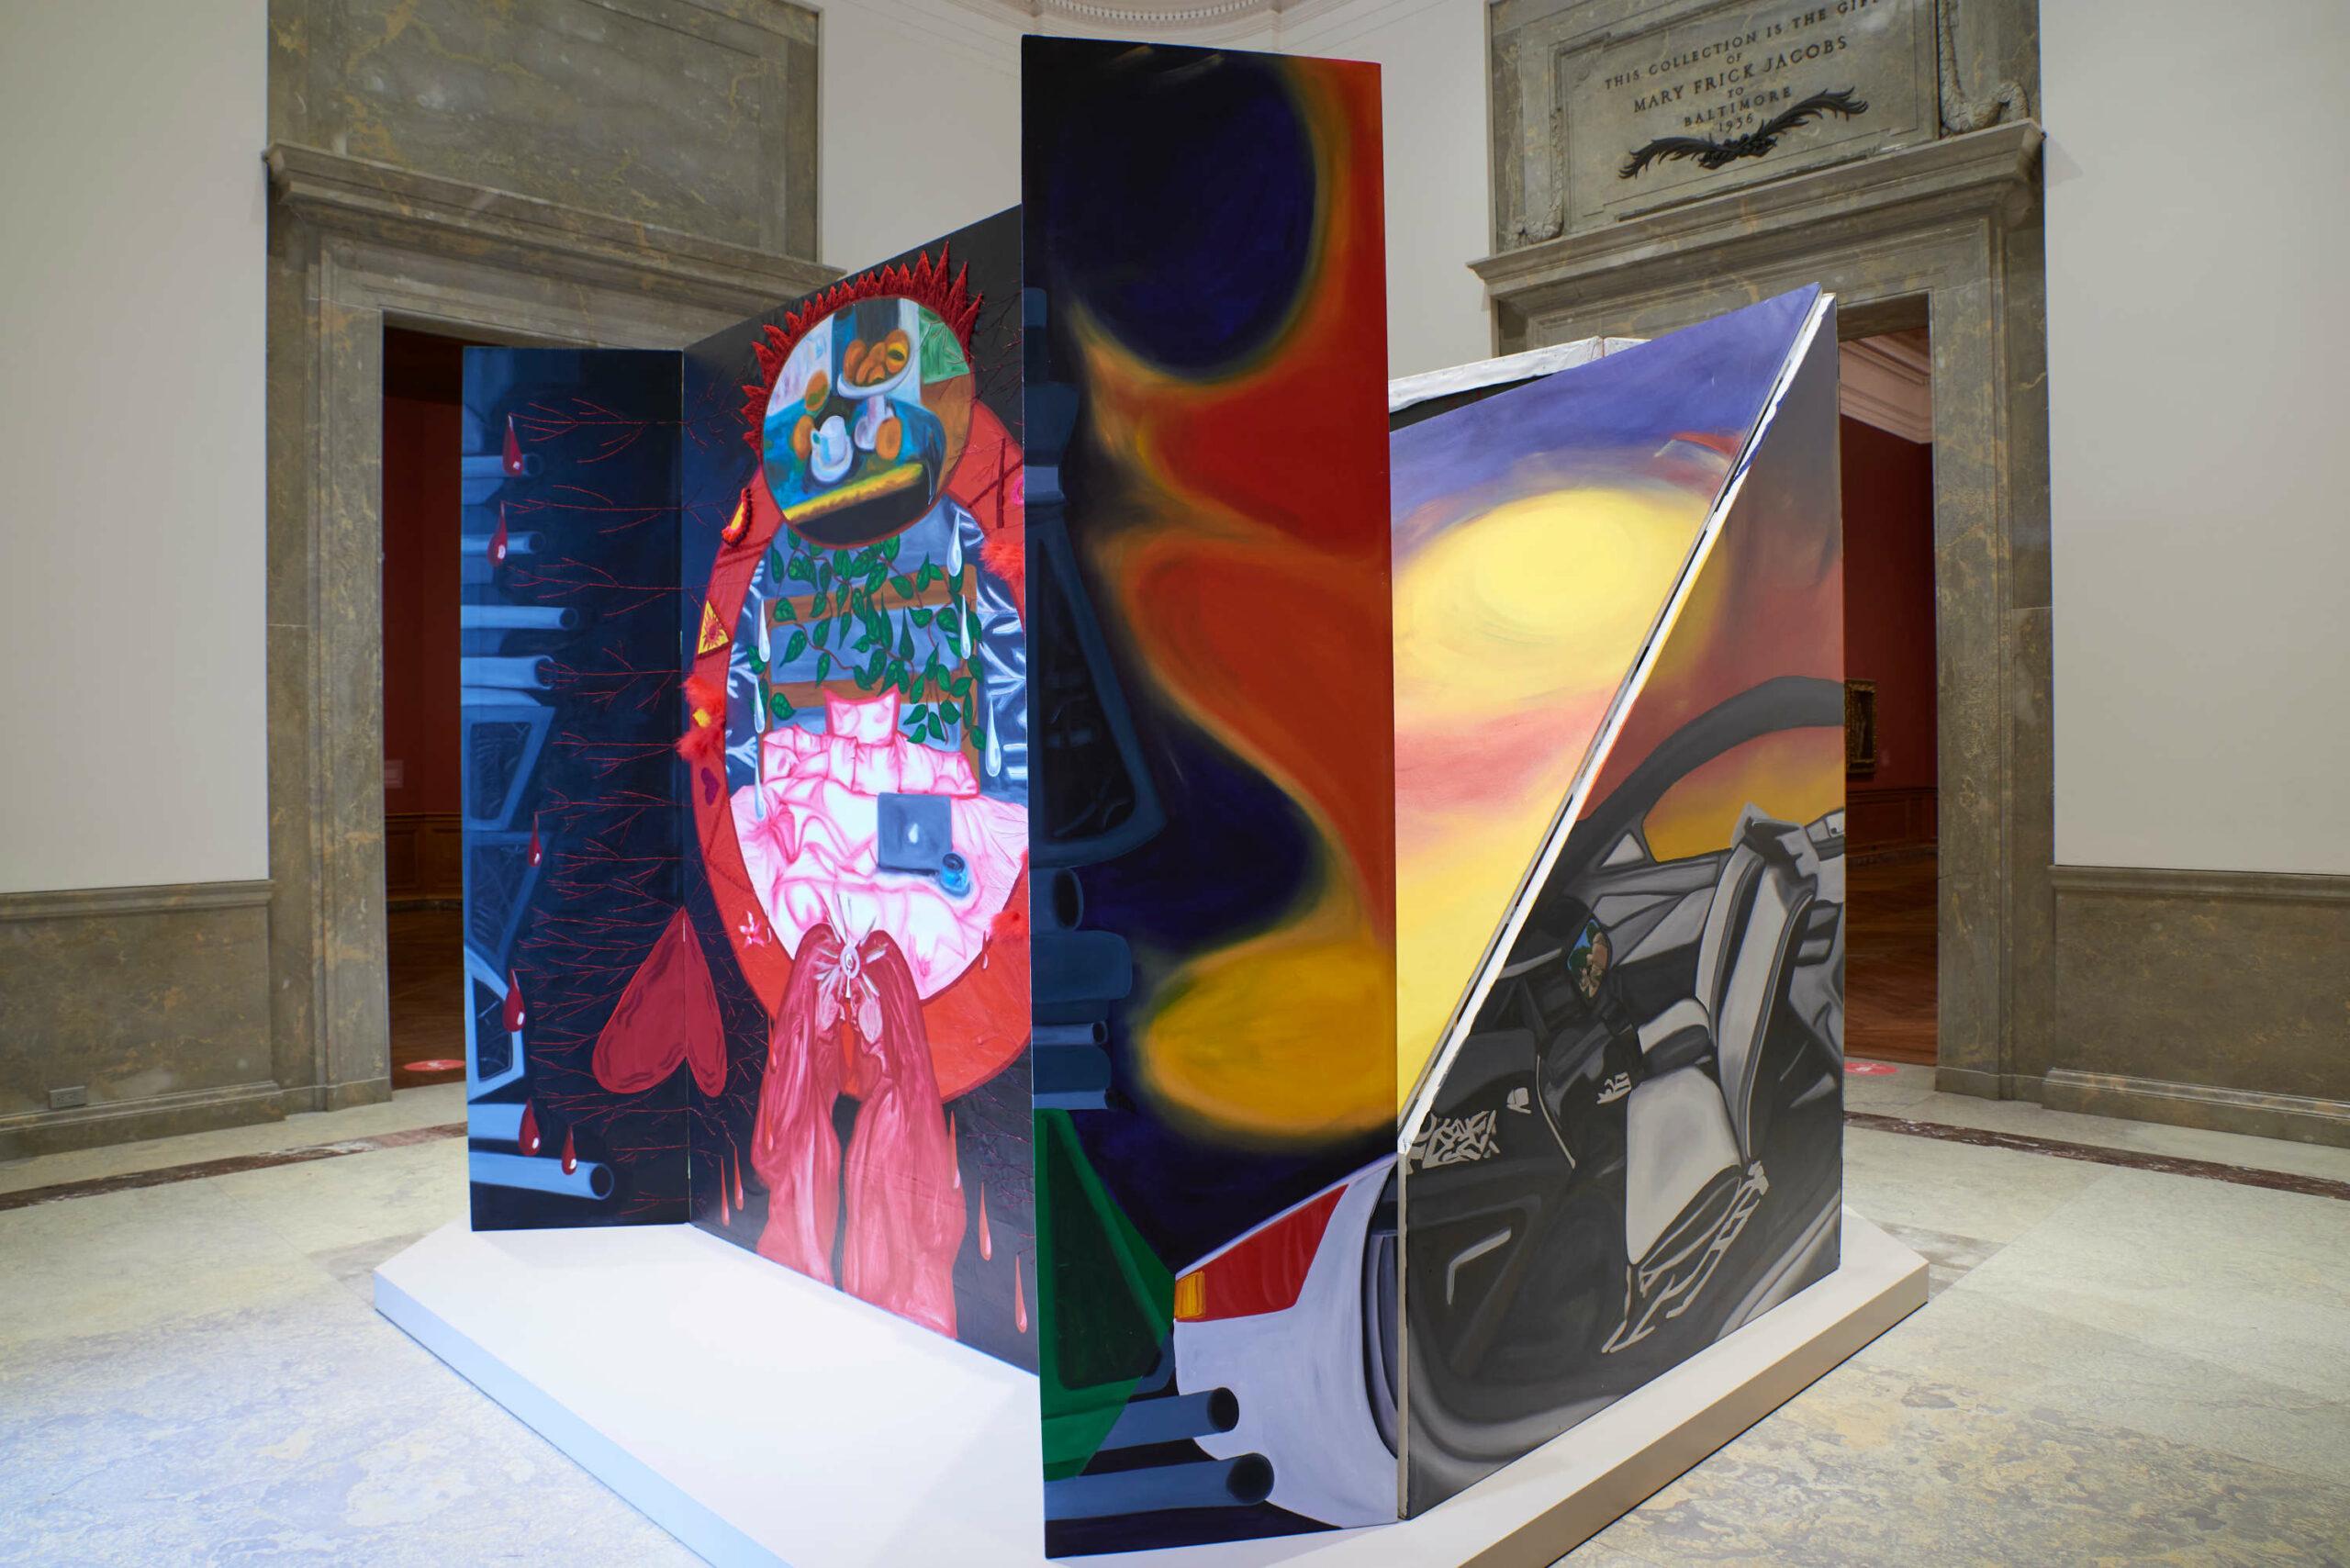 BMA Presents Frieda Toranzo Jaeger: The Perpetual Sense of Redness